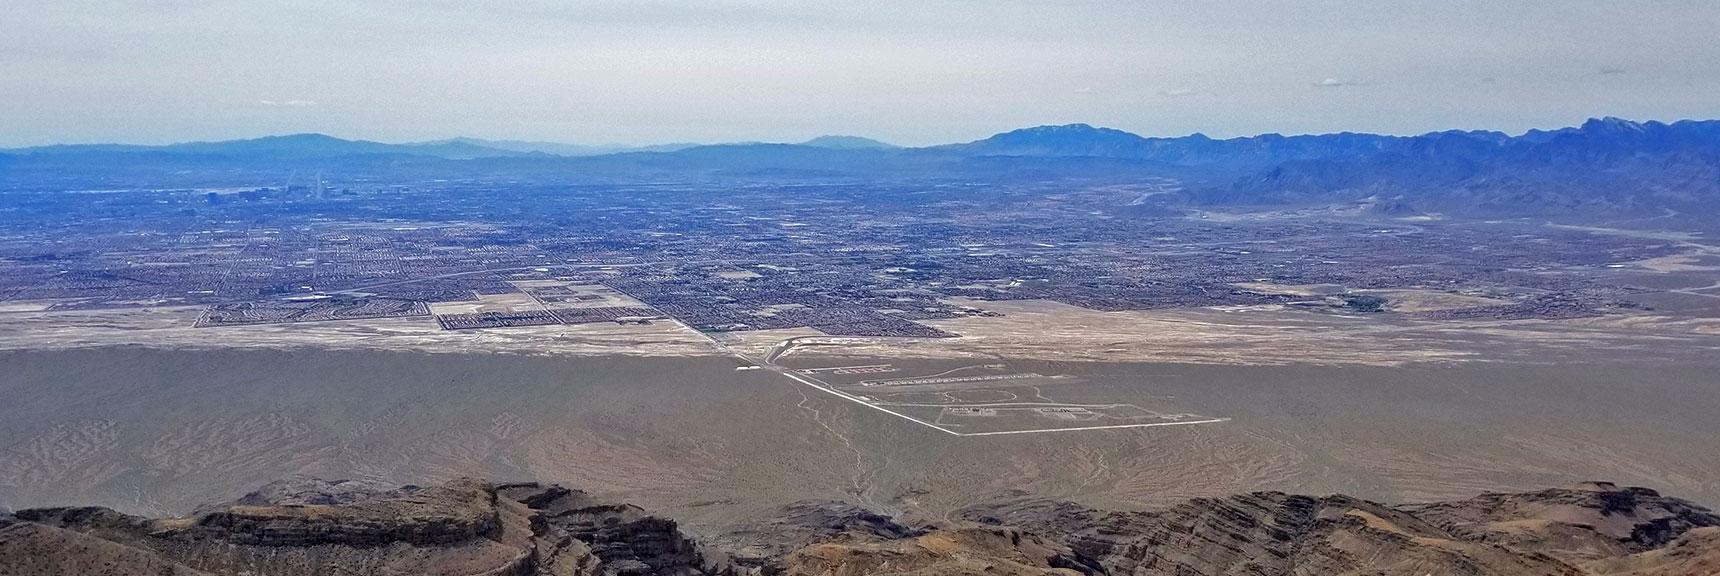 View of Northern Las Vegas from Near the Gass Peak Eastern Summit | Gass Peak Eastern Summit Ultra-marathon Adventure, Nevada